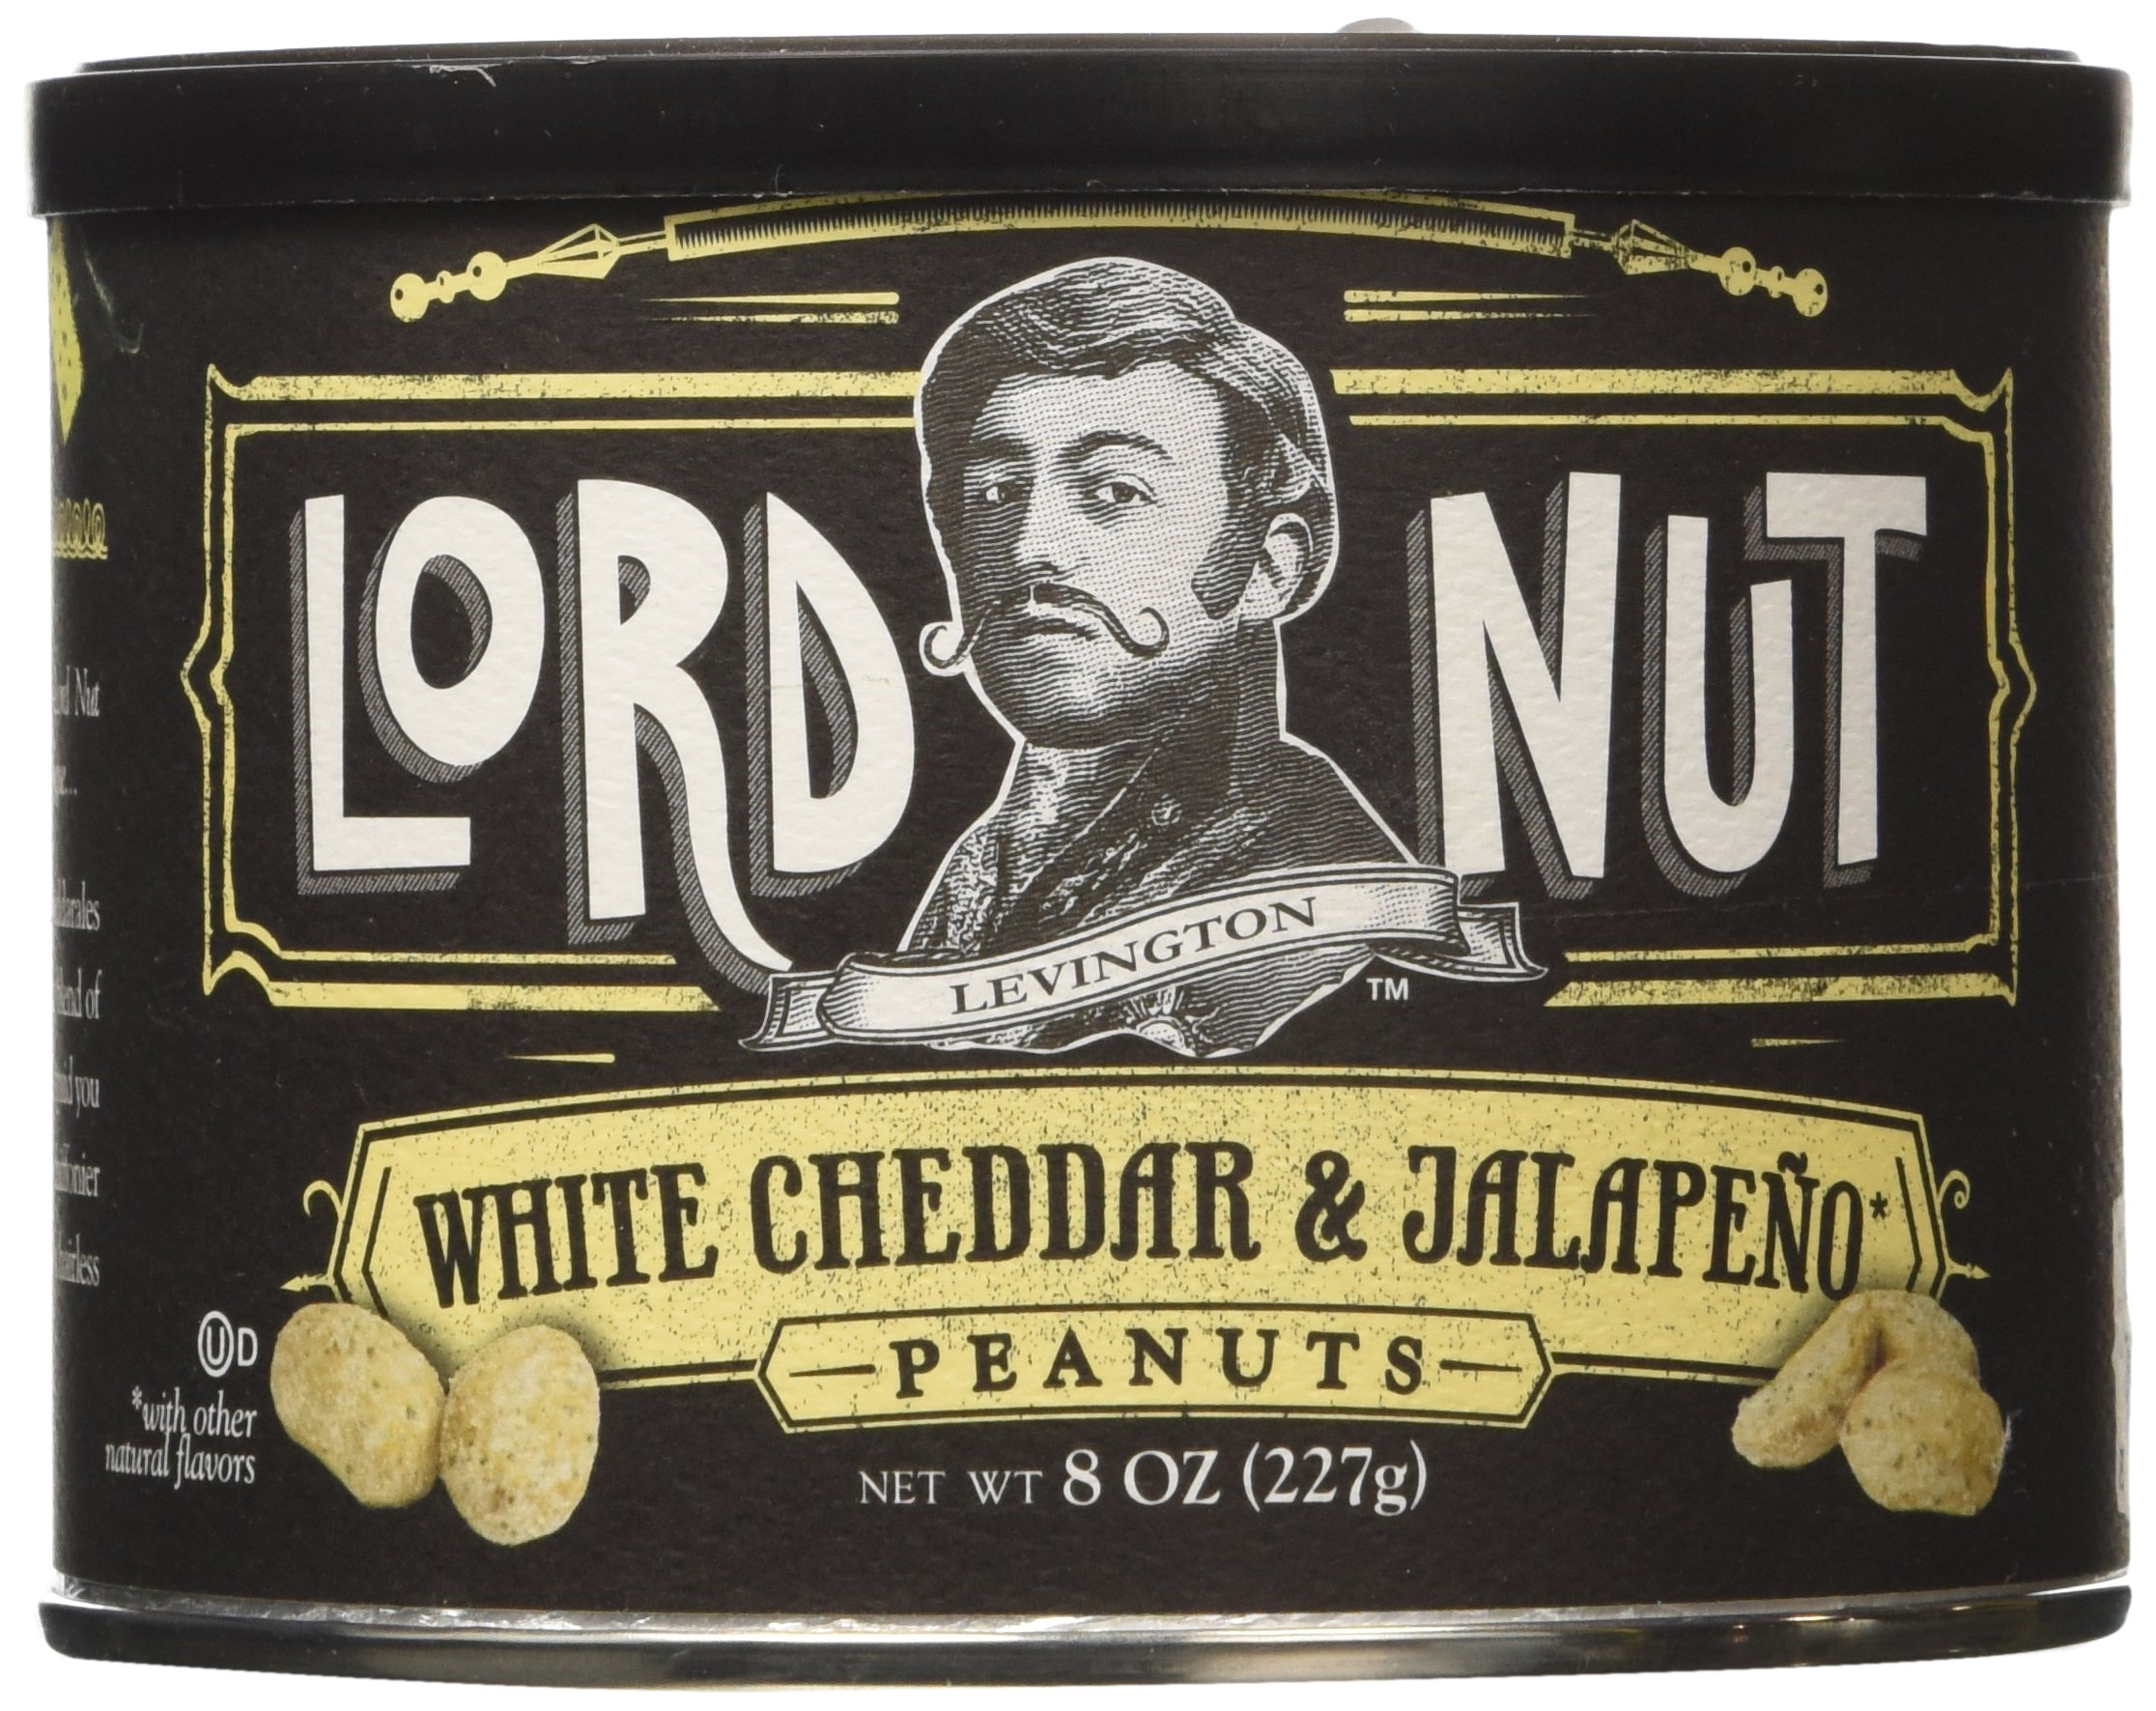 Lord Nut Levington Peanuts, White Cheddar & Jalapeno, 8 Ounce